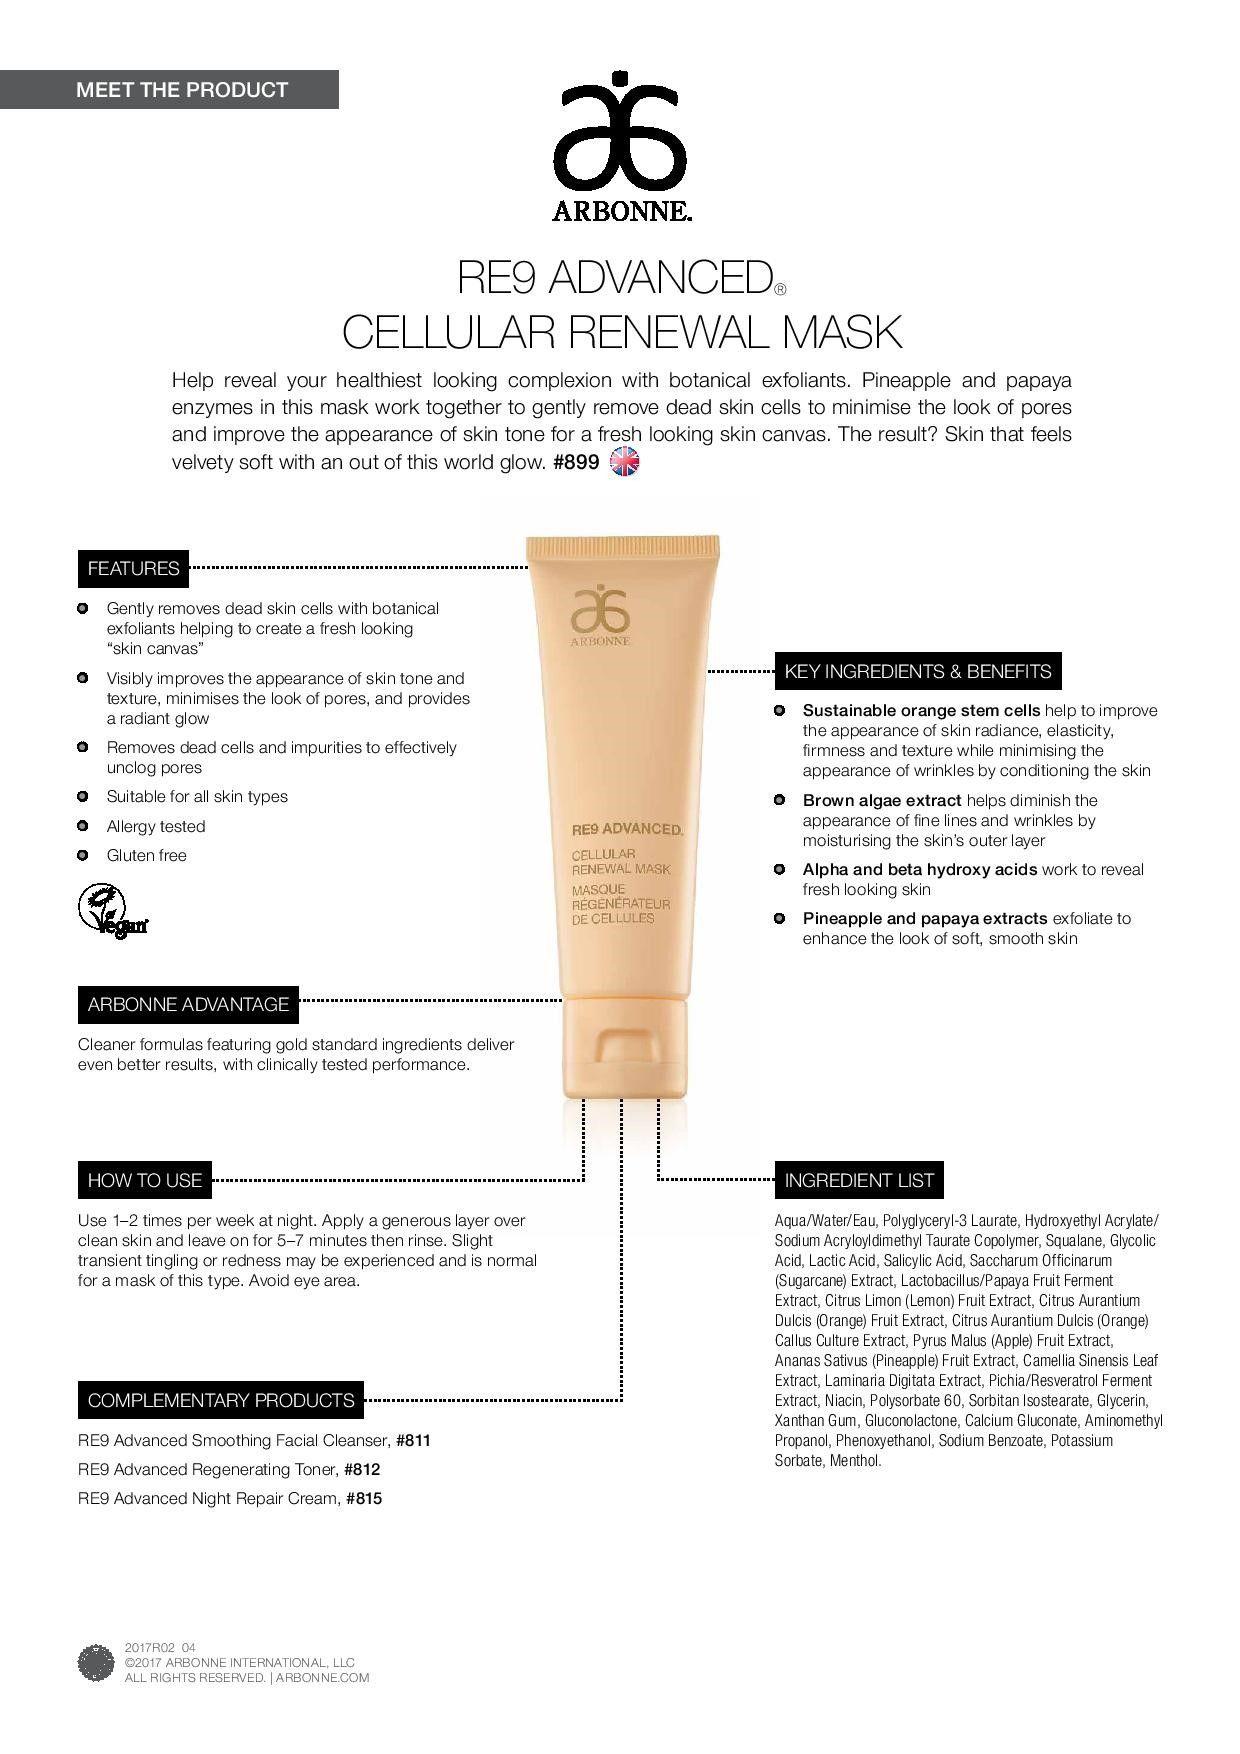 Arbonne | RE9 Advanced Cellular Renewal Mask | Anti-Aging